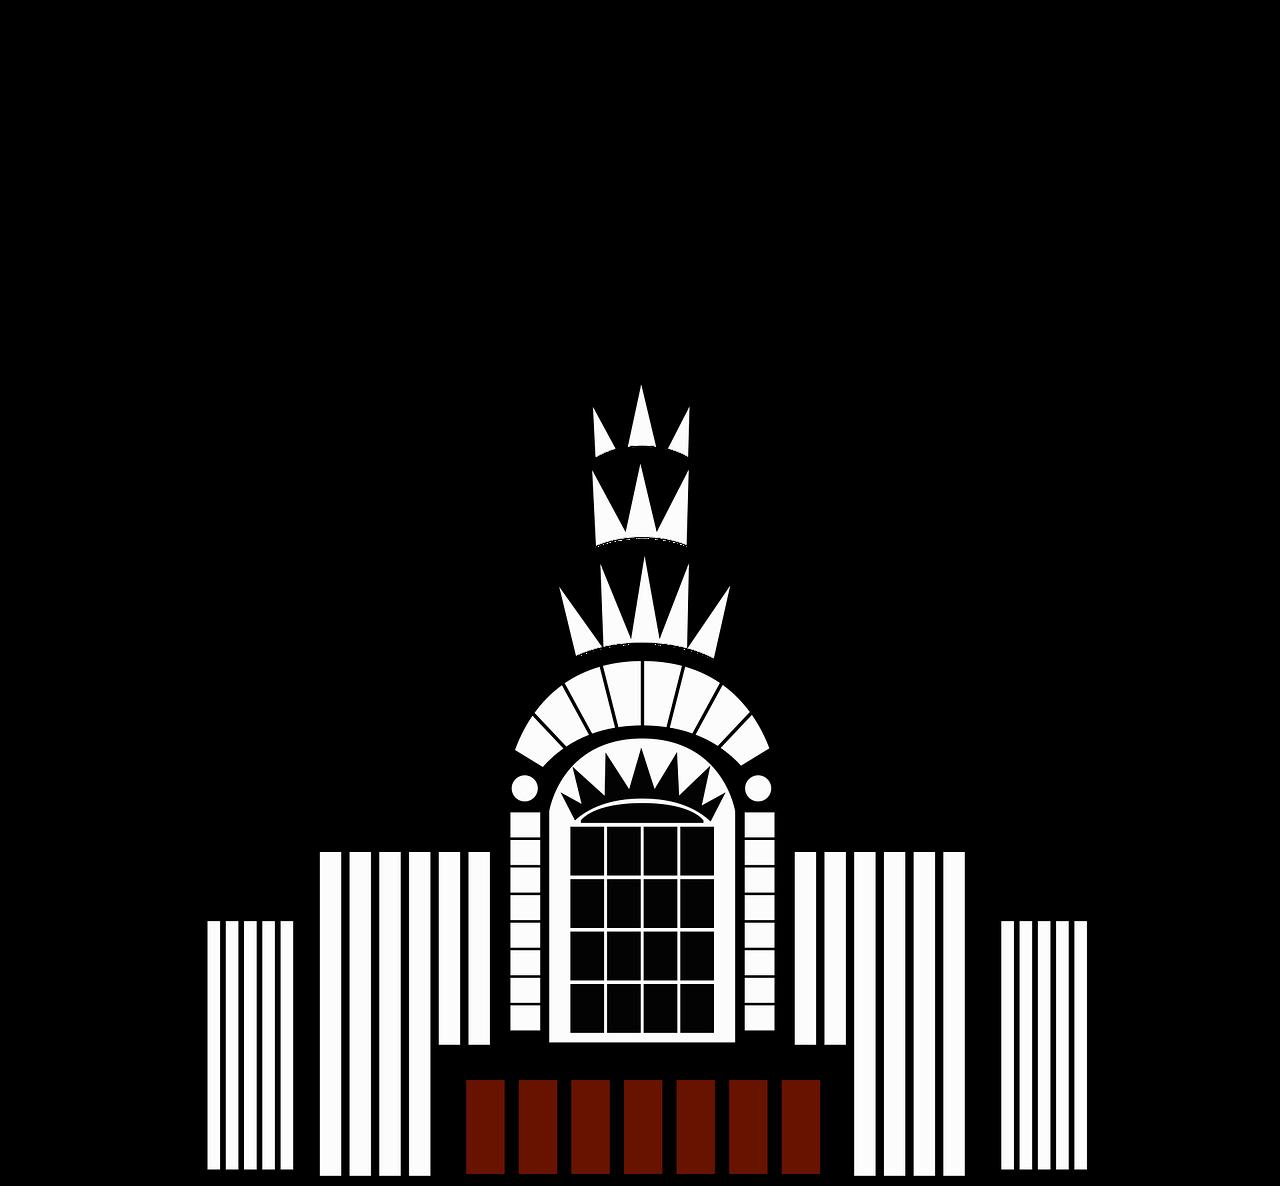 png black and white Skyscraper clipart. Vintage clip art building.